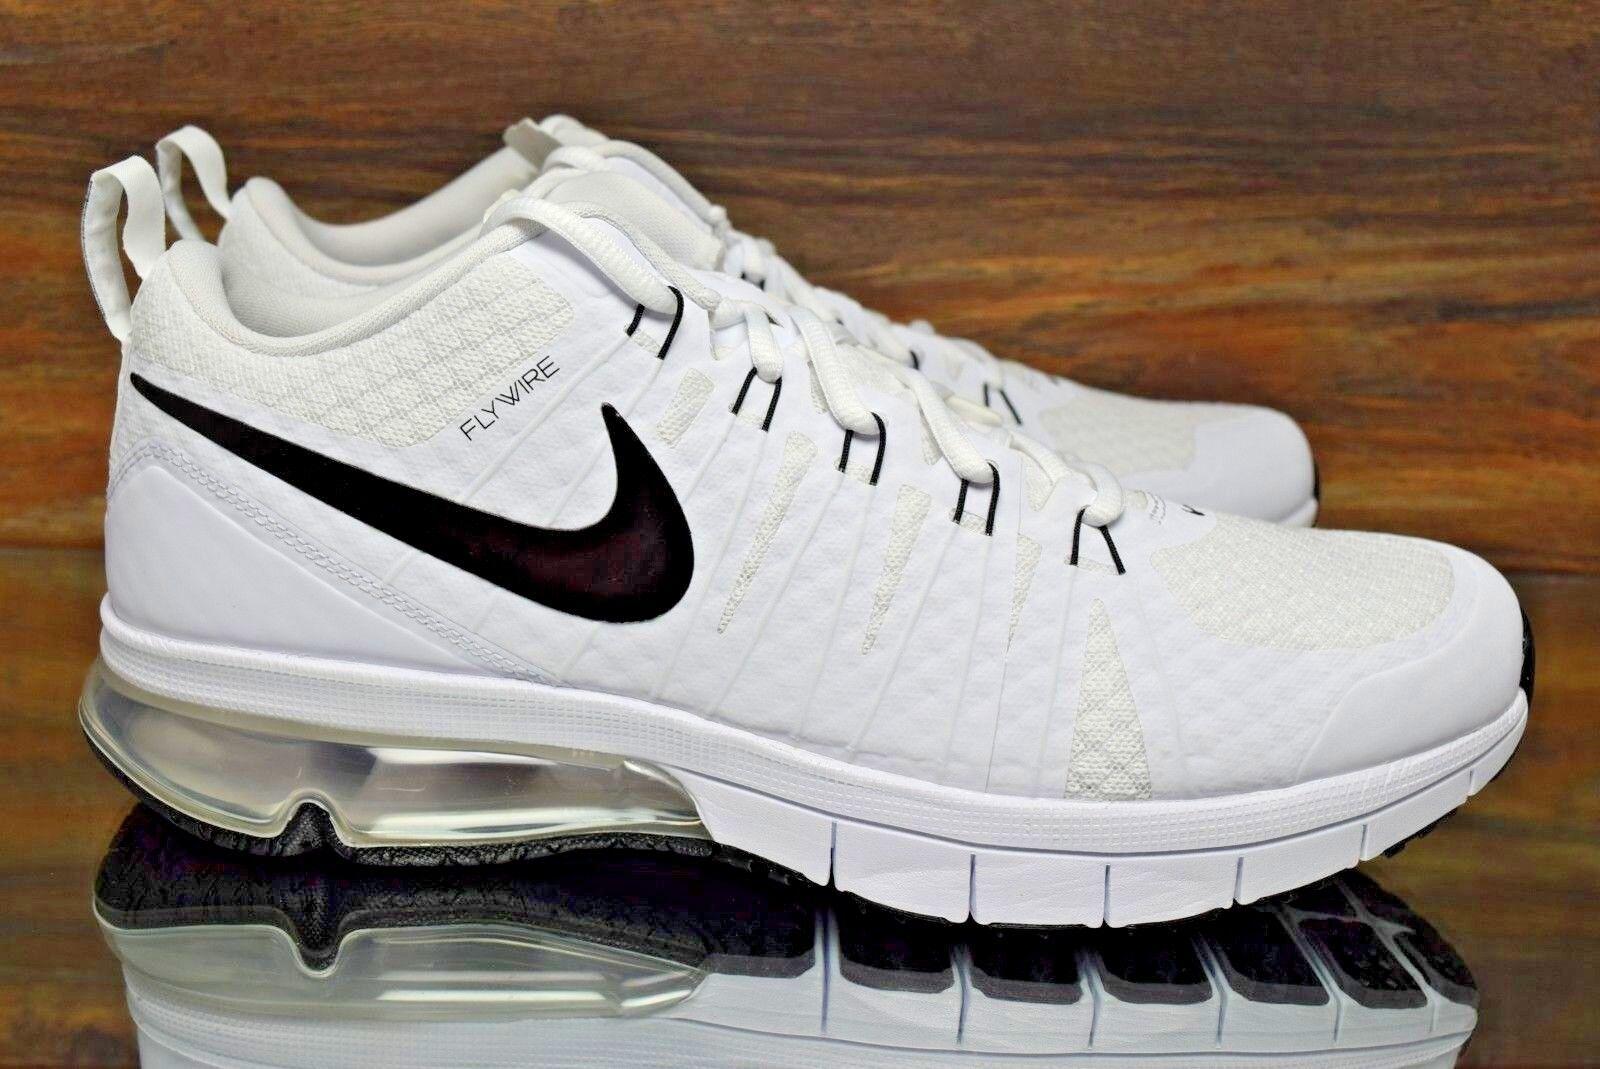 Men's Nike Air Max TR180 Training Shoes 723972 001